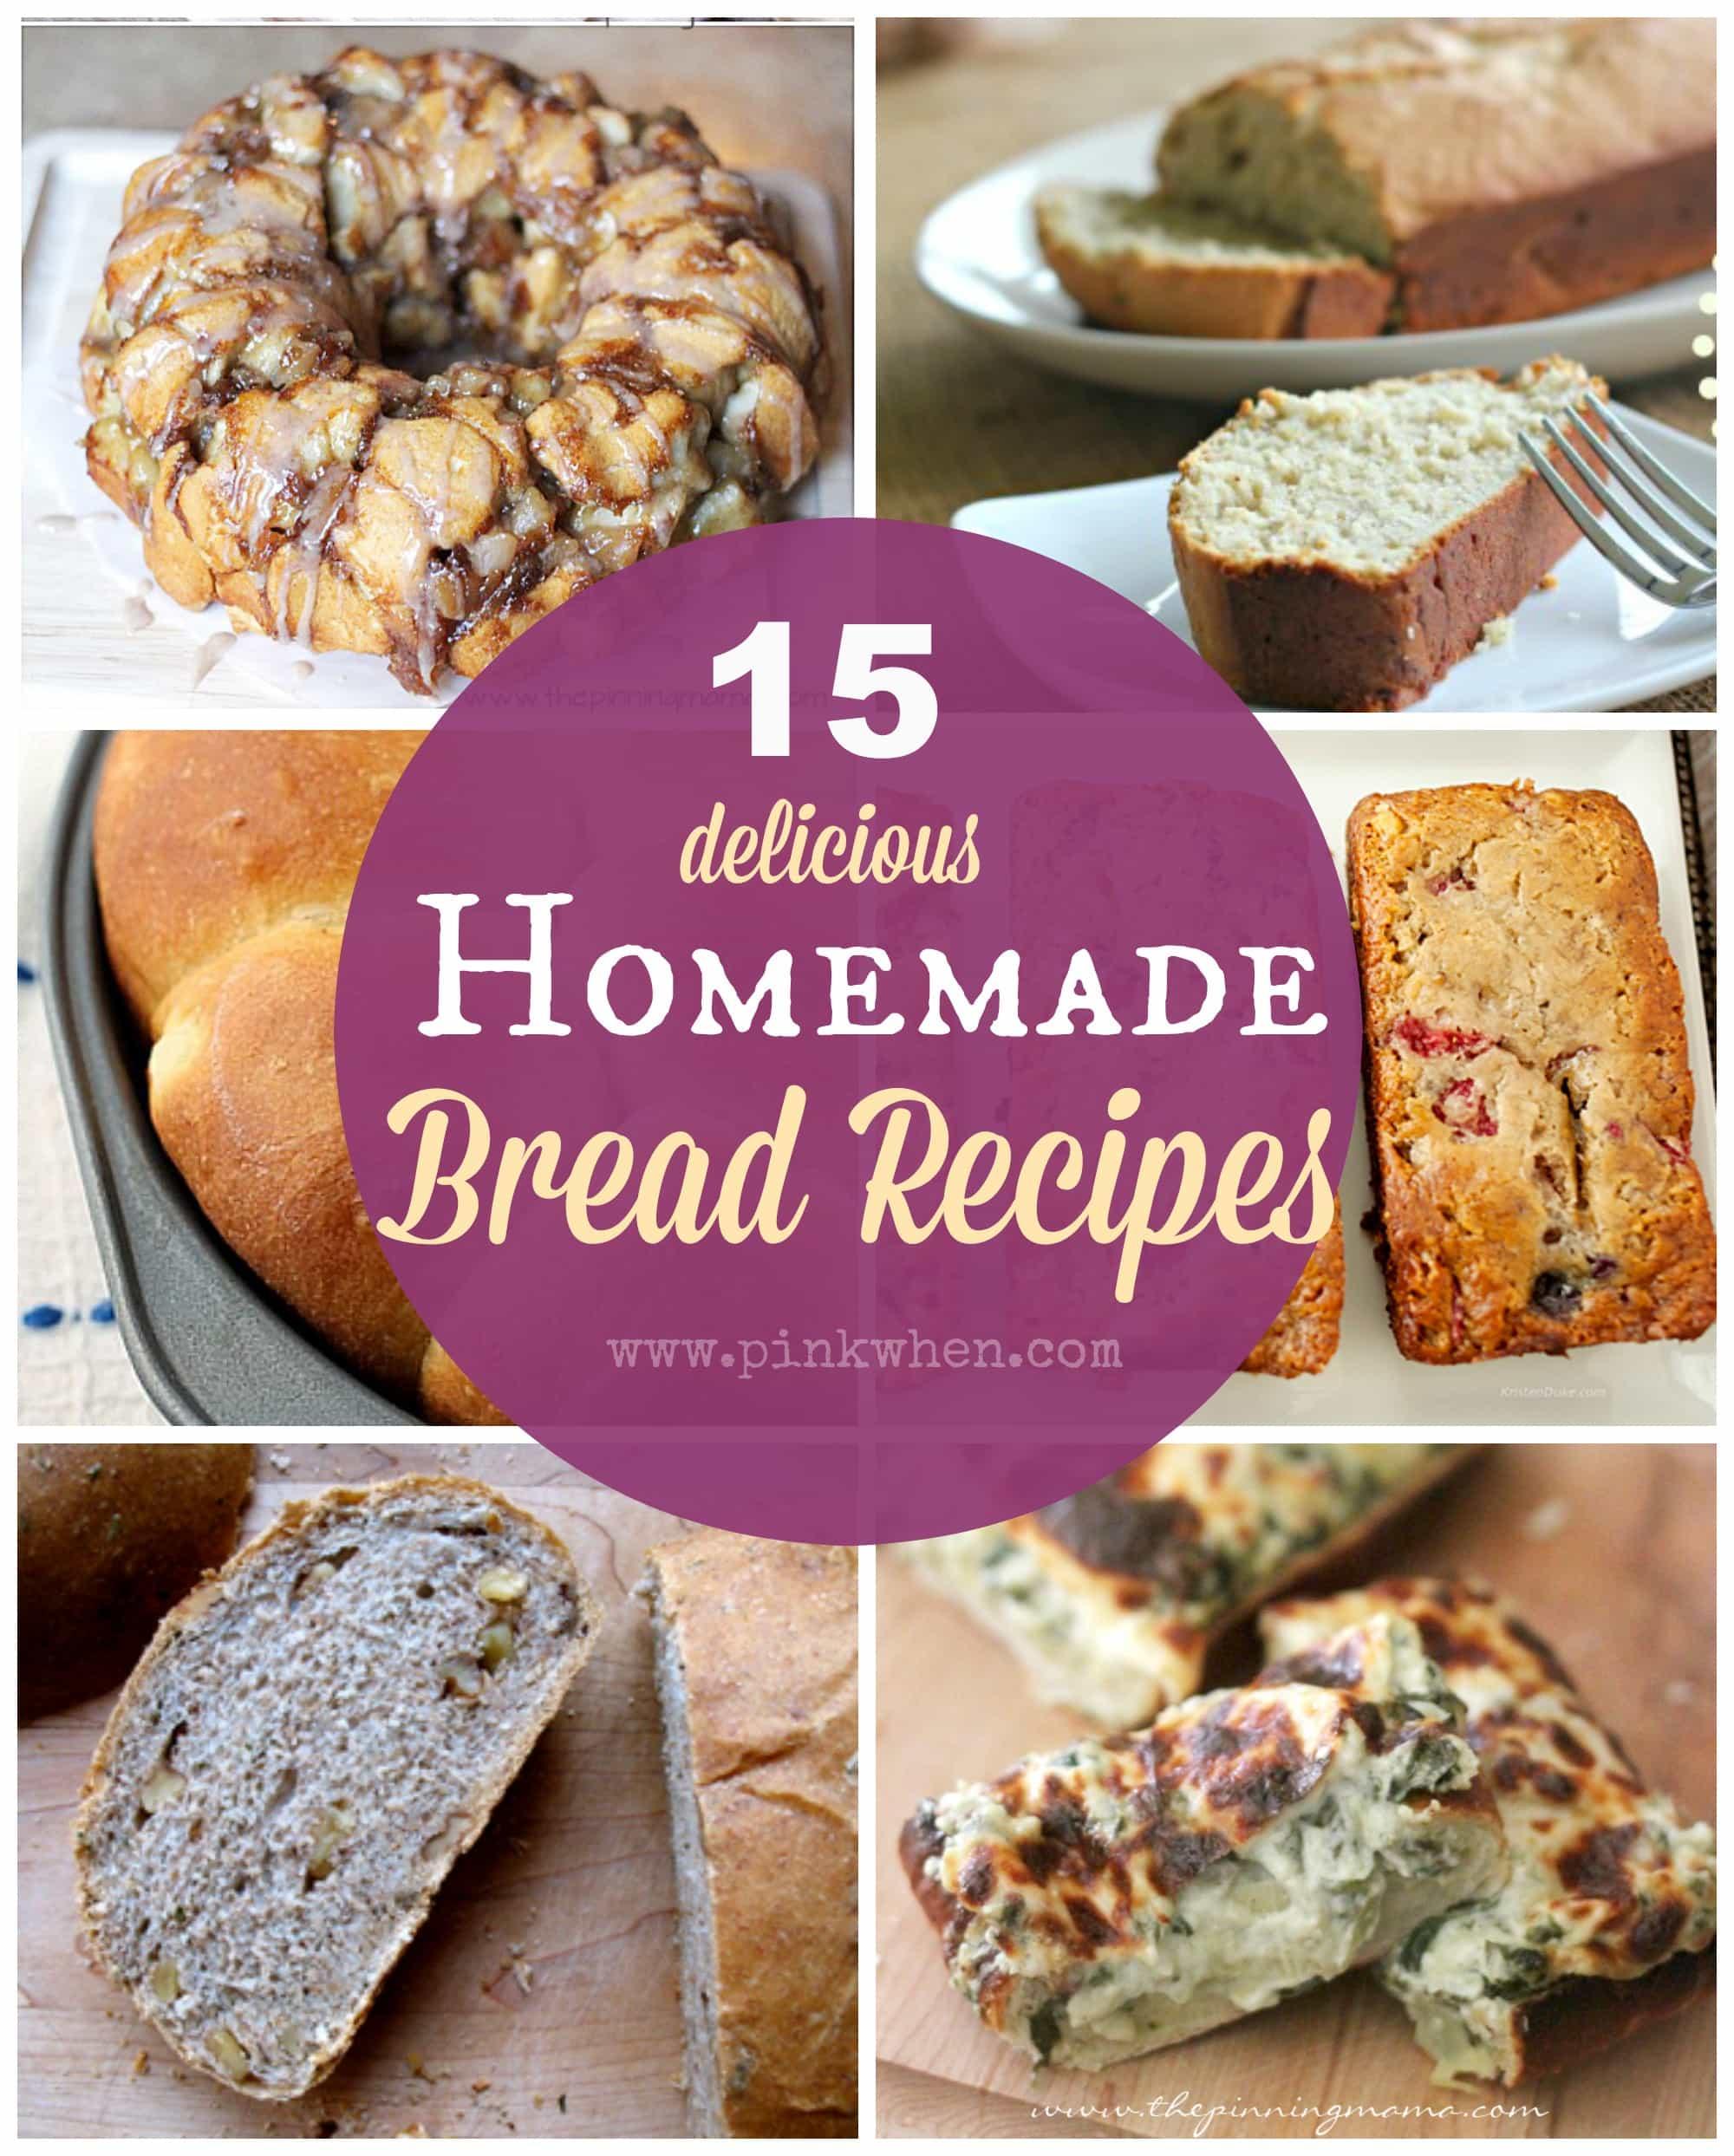 15 delicious Homemade Bread Recipes via PinkWhen.com